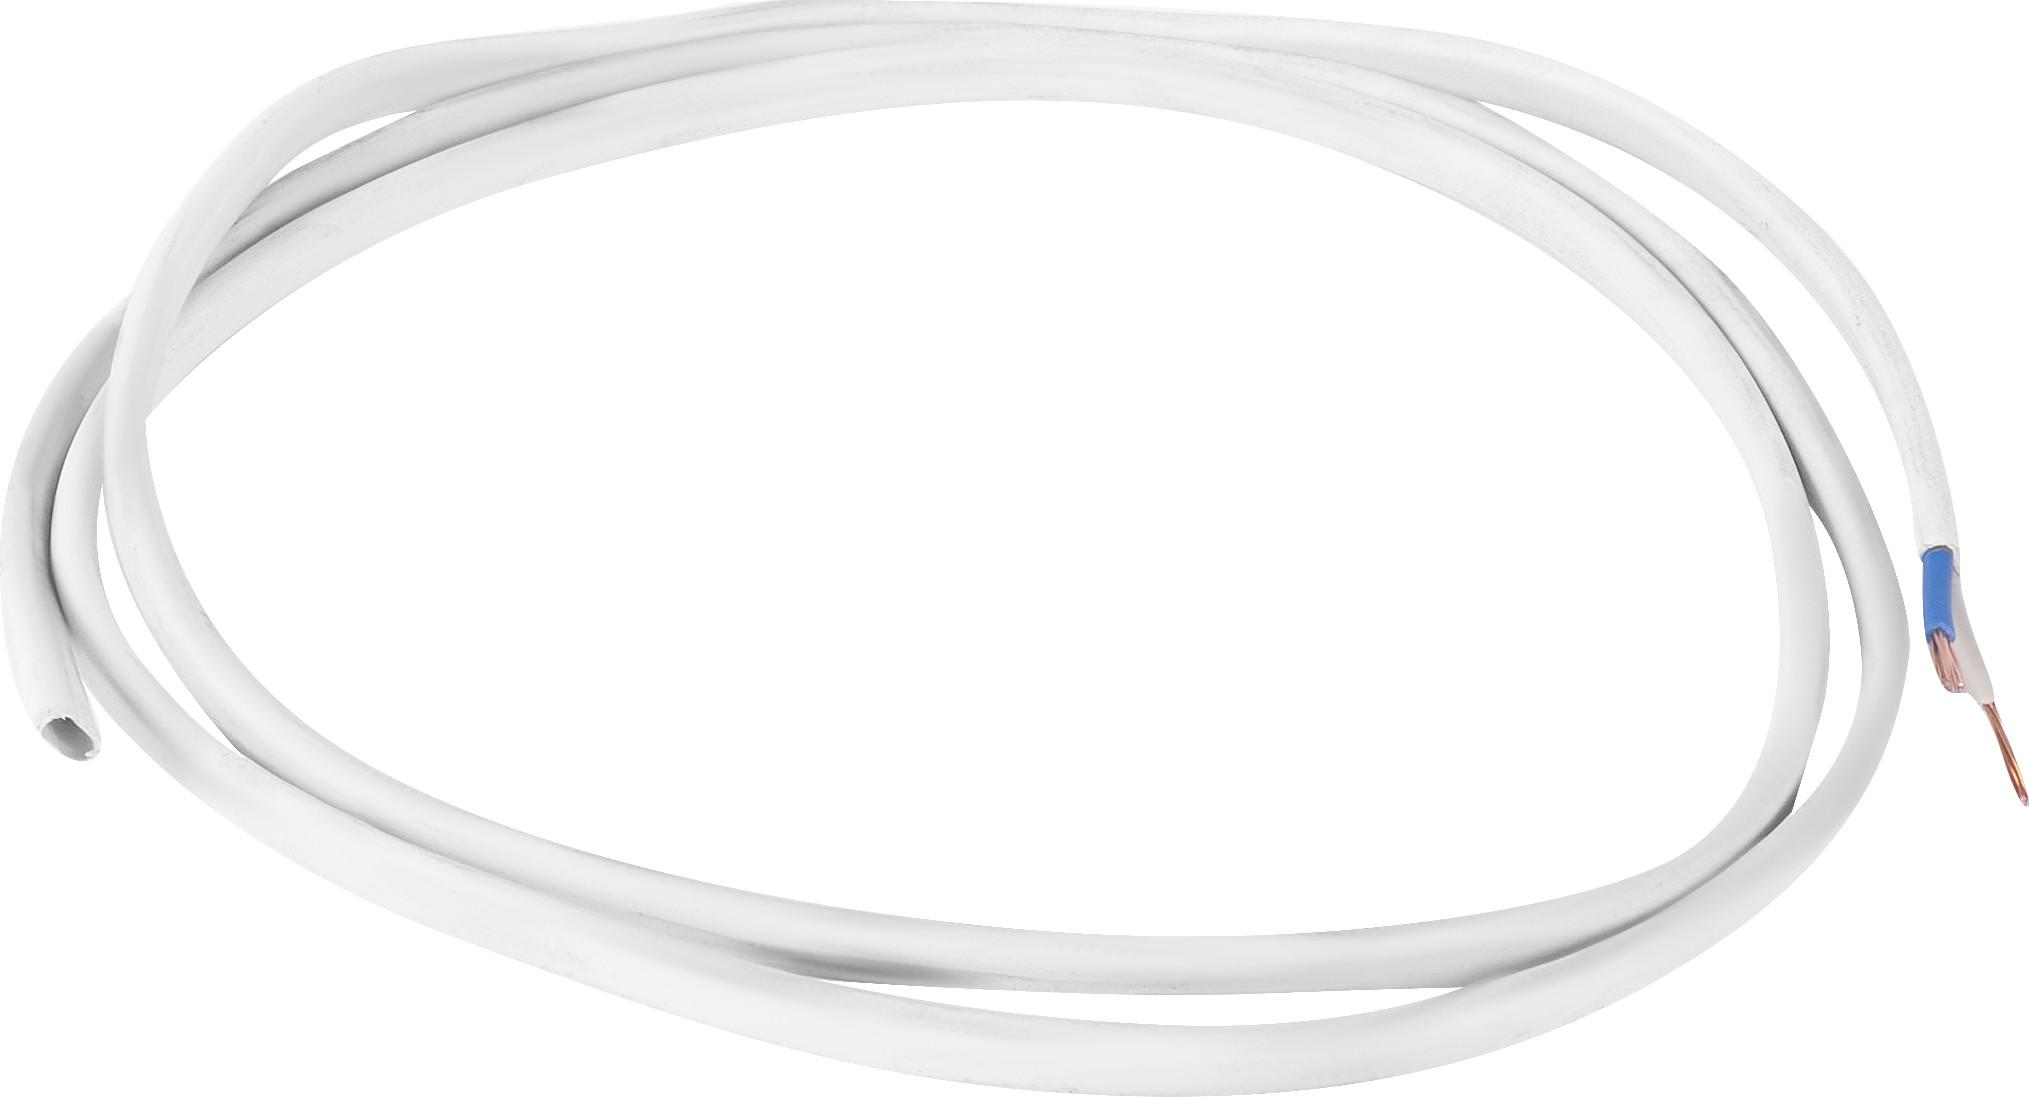 Провод гибкий ПУГНПбм 2х1.5 мм на отрез